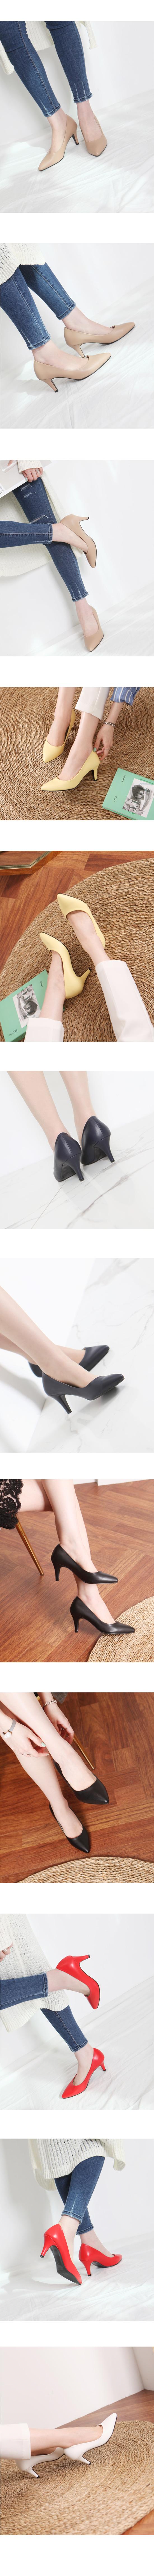 Stiletto high heel basic shoes 7cm jean beige